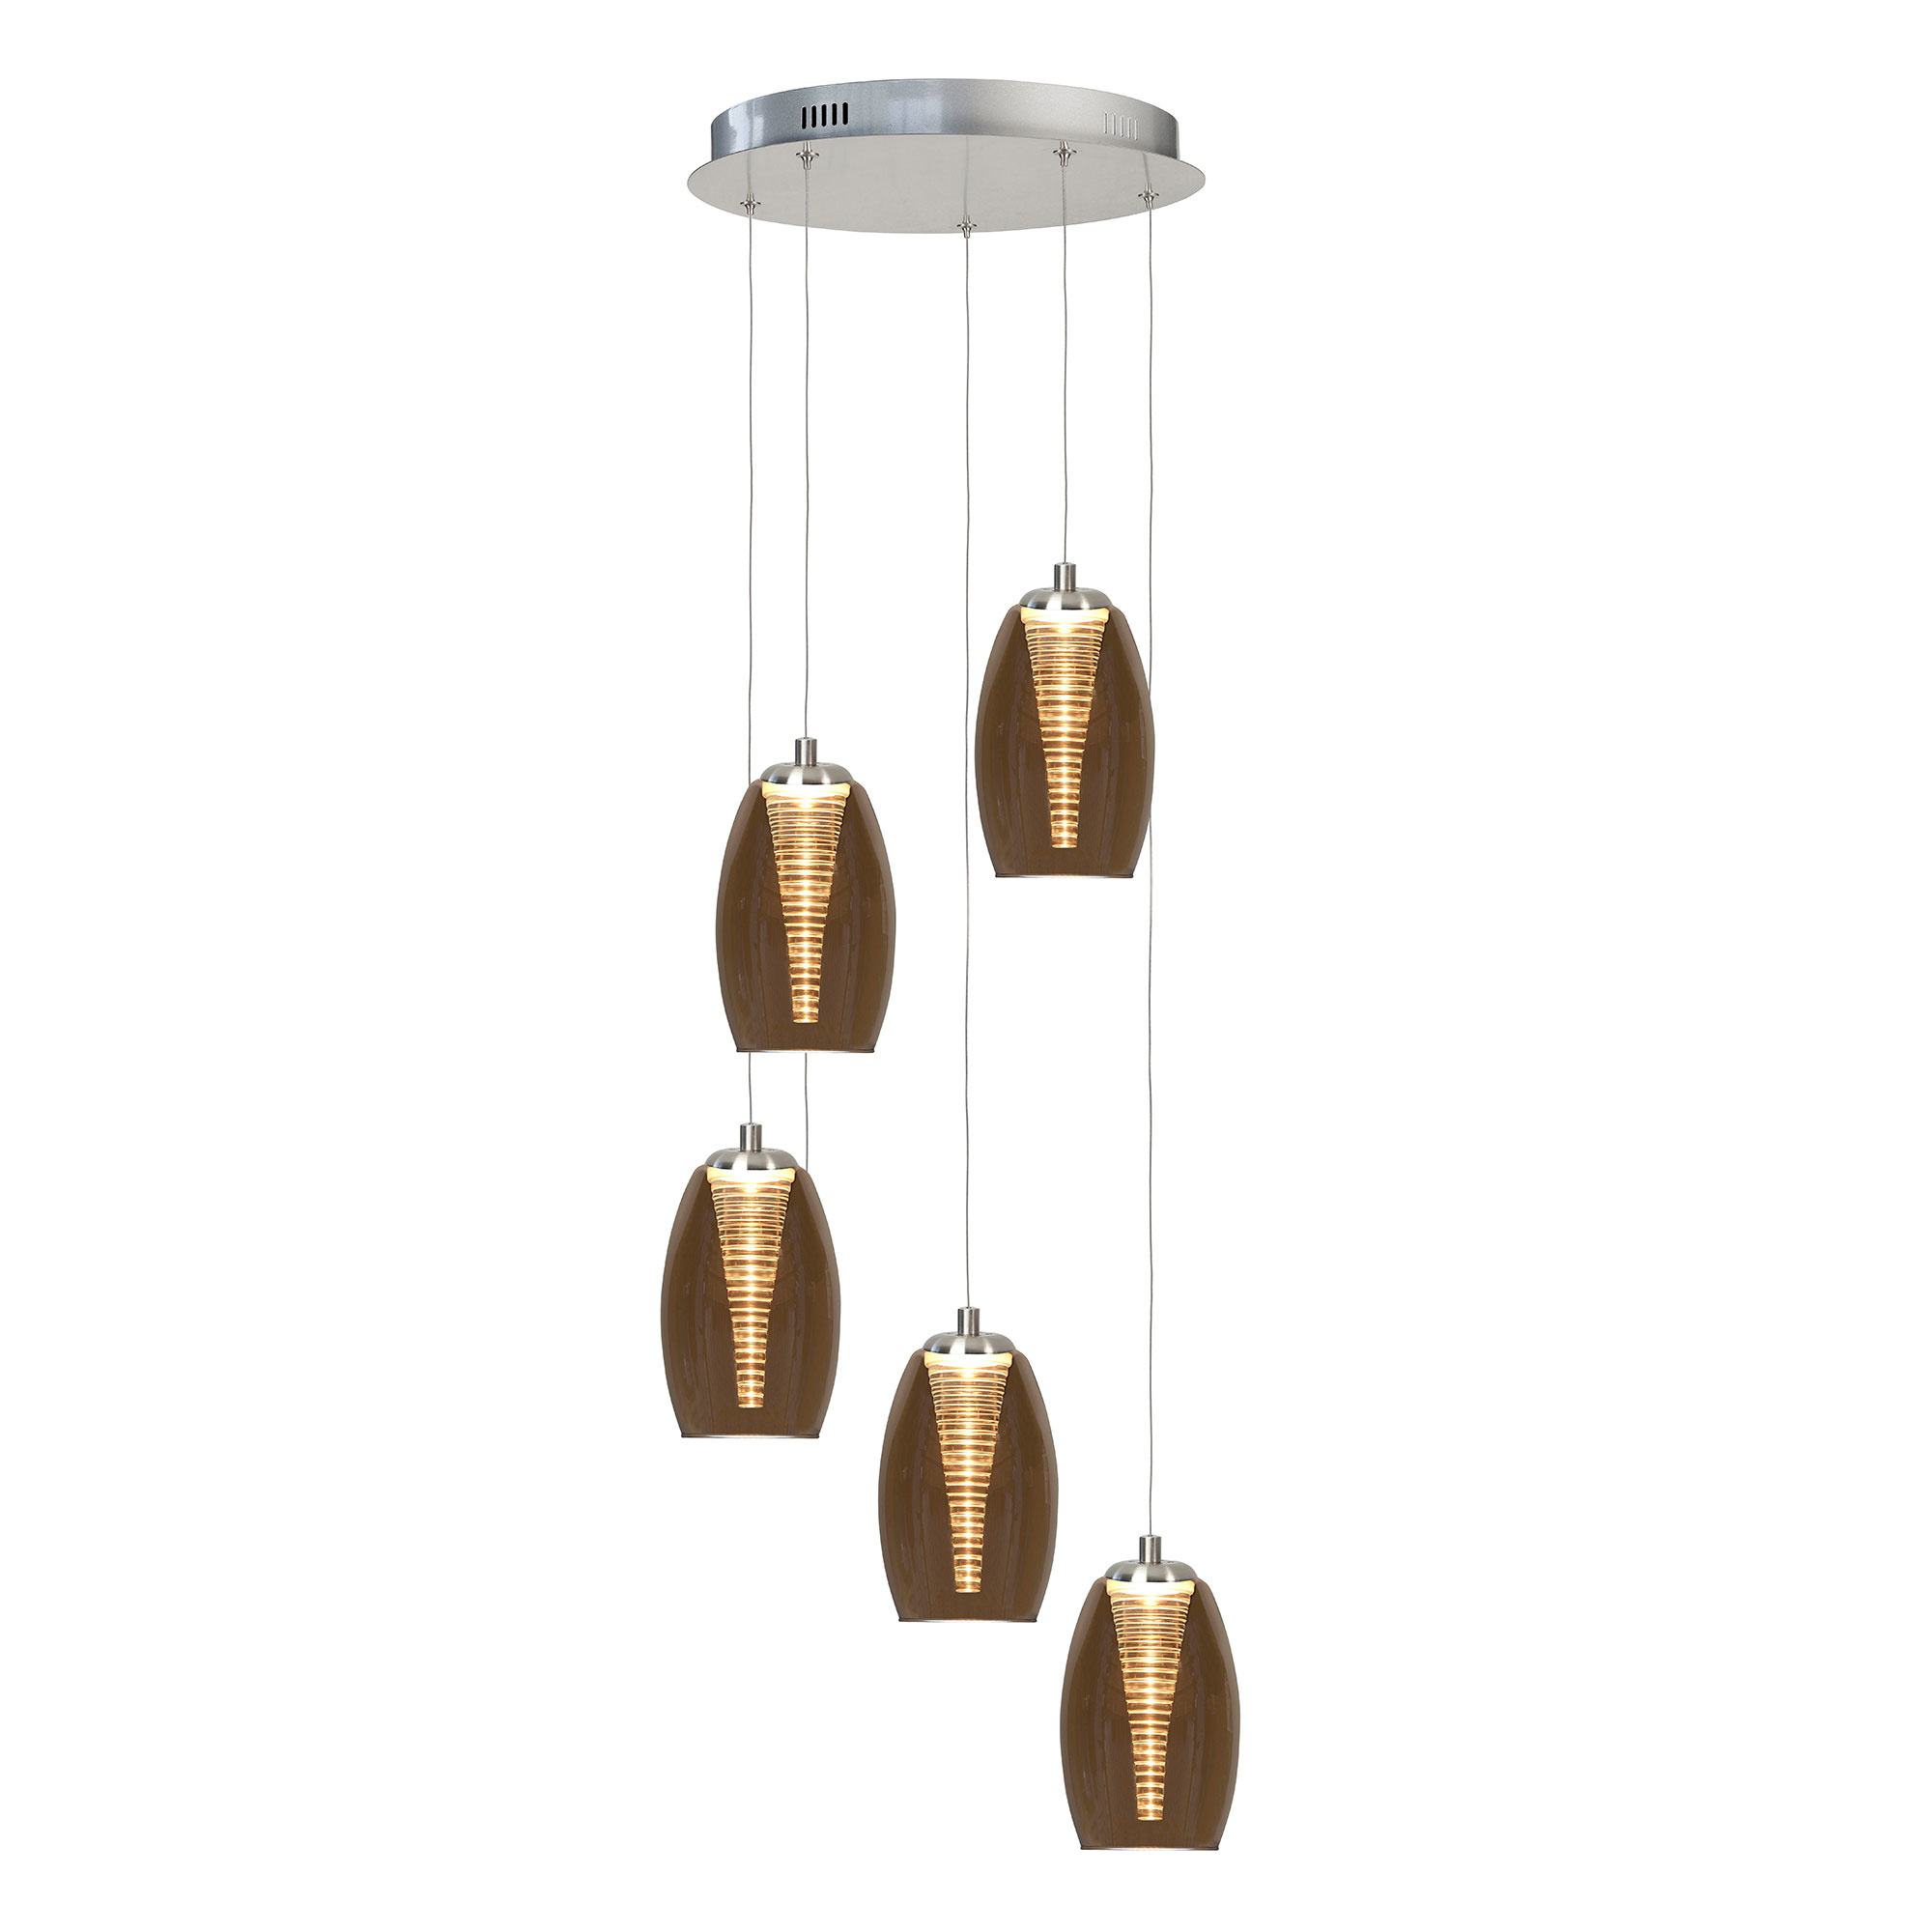 Highlight Hanglamp Nebula 5 Lichts Ø 35 Cm Amber Glas